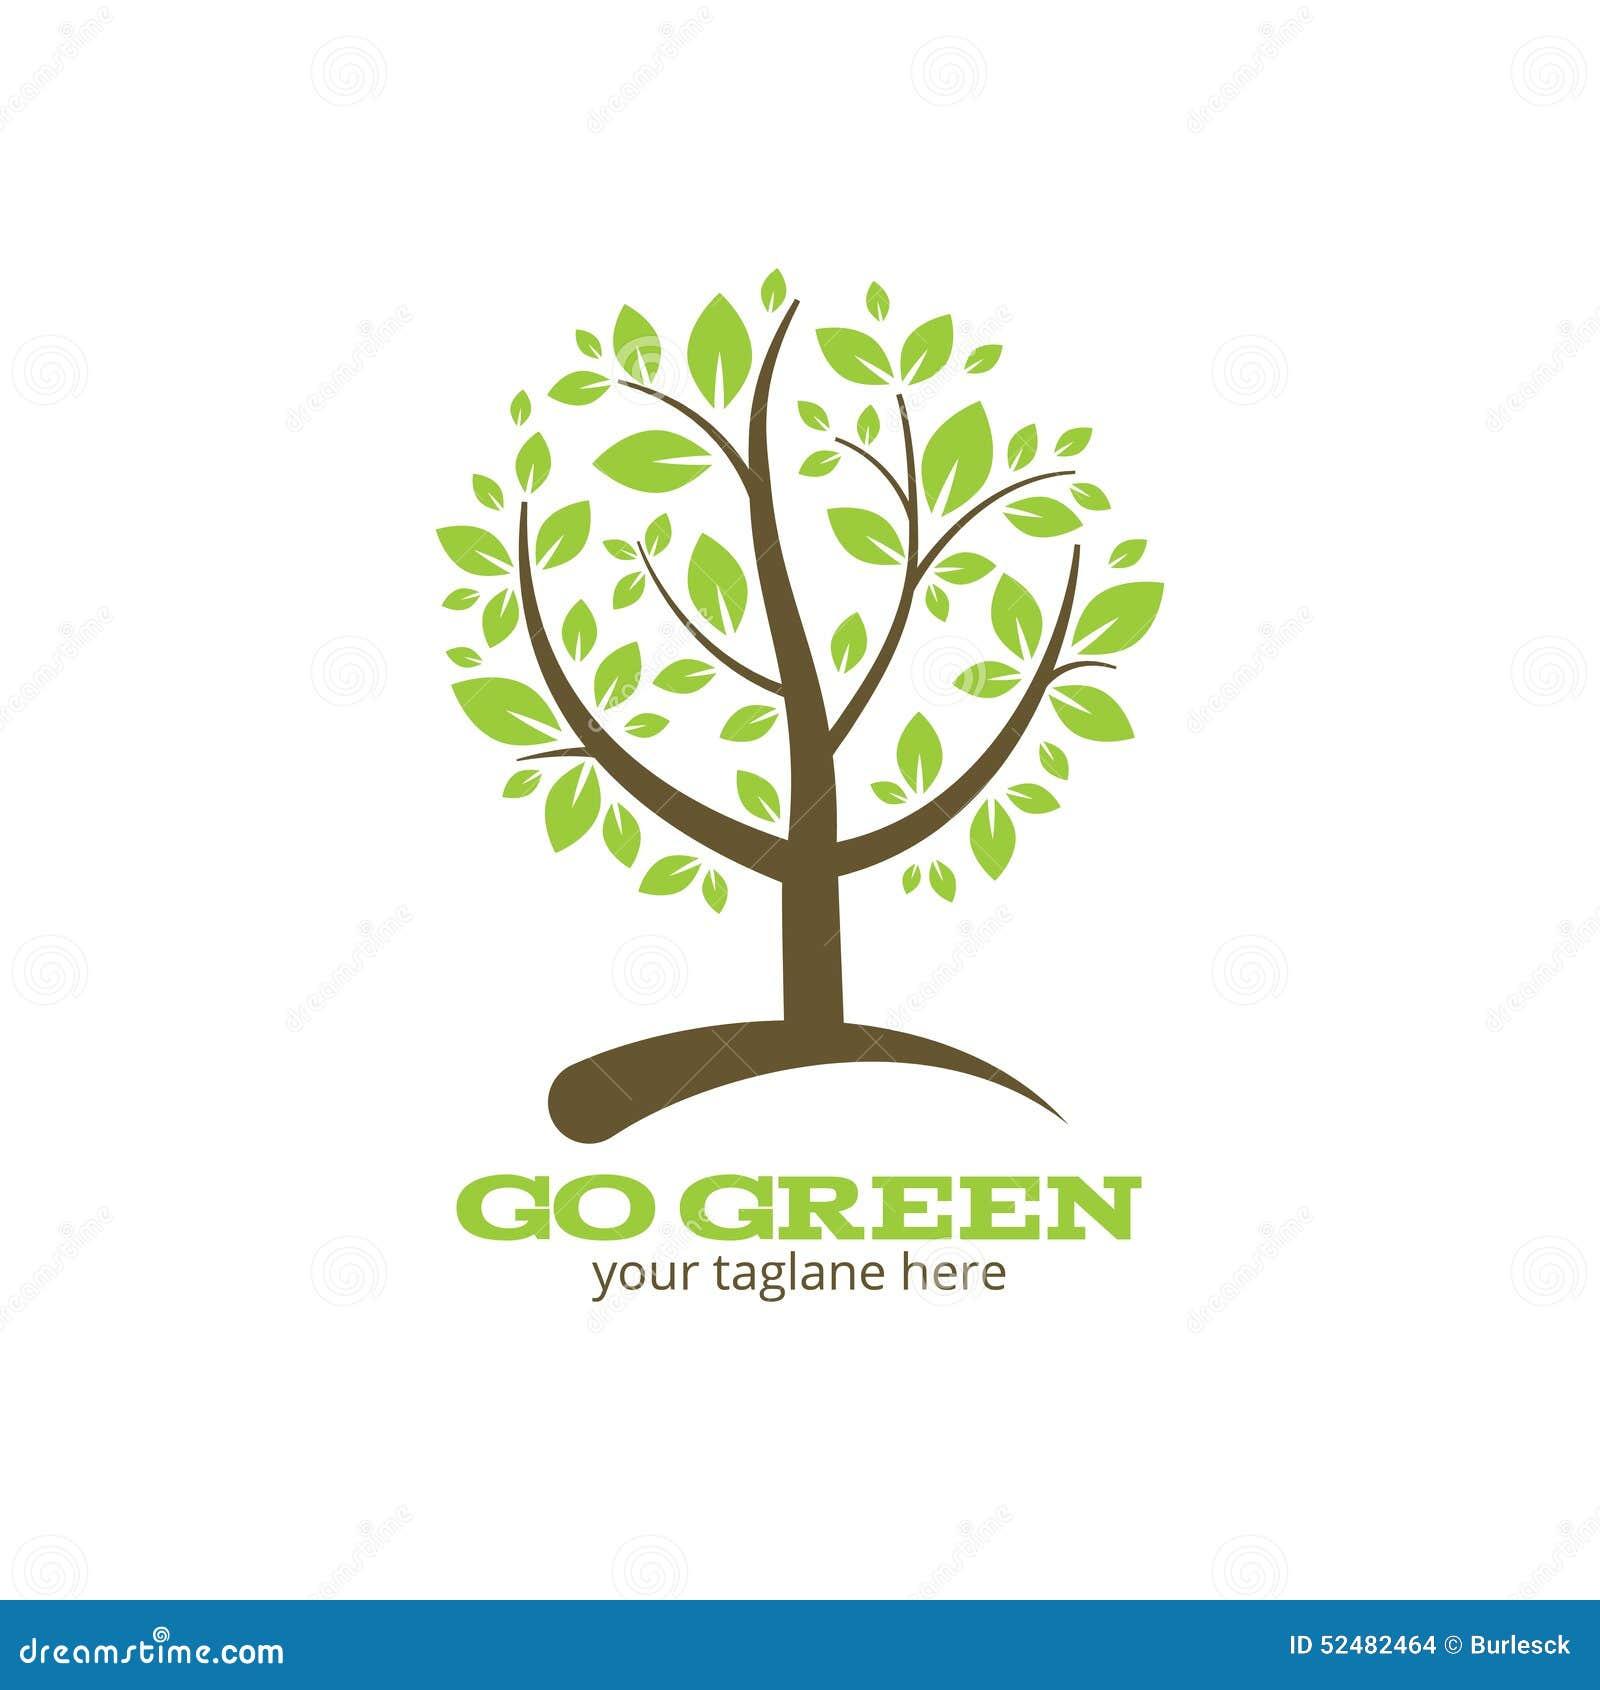 Go Green Tree Logo Stock Vector Illustration Of Natural 52482464